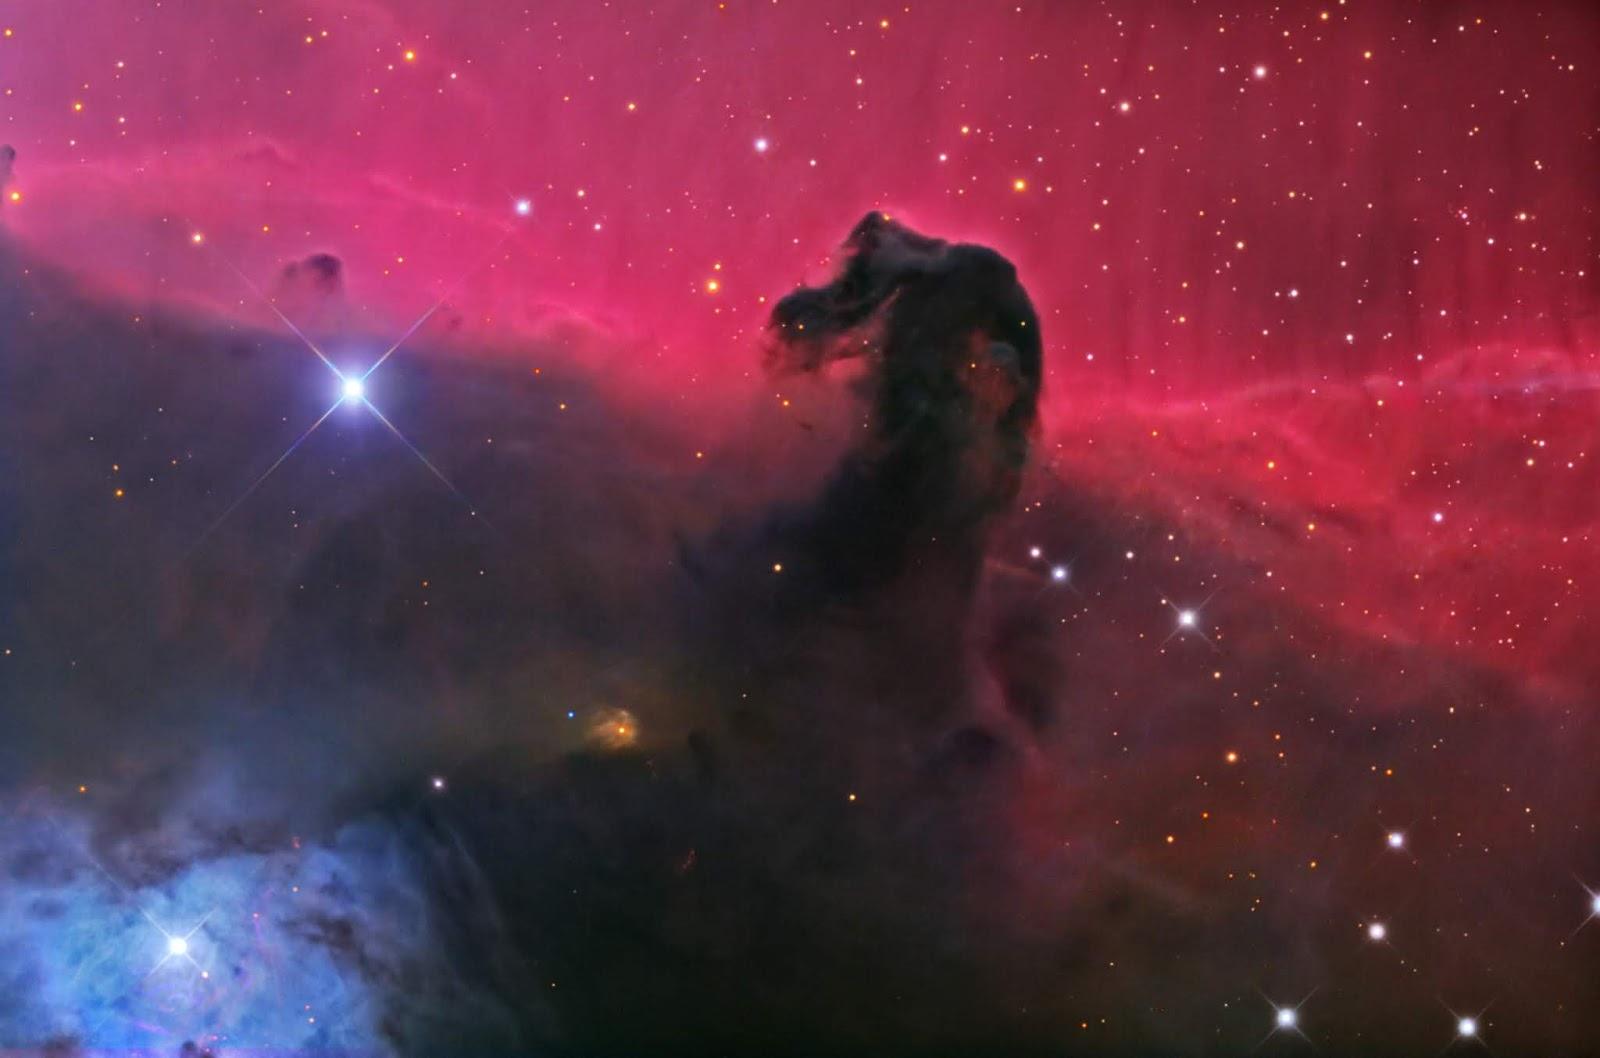 https://archive.org/details/nebulae